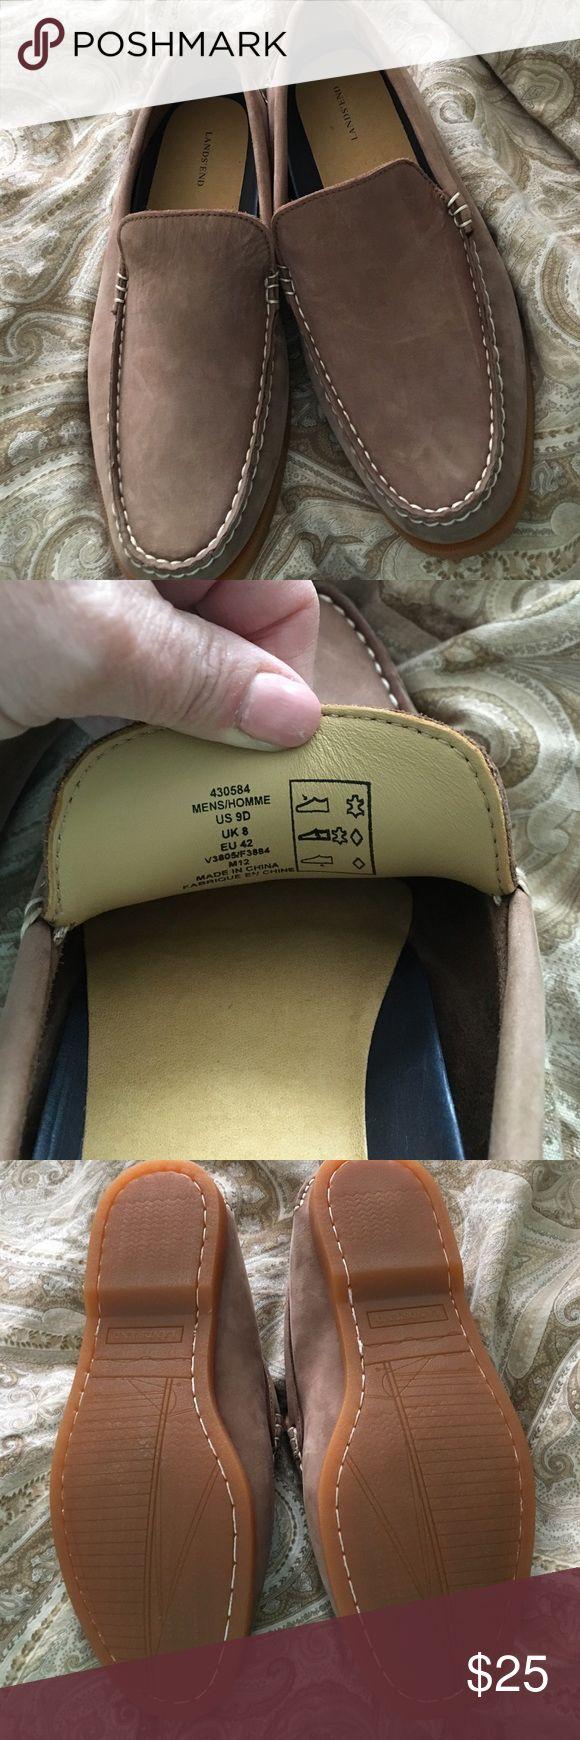 LandsEnd Tan Loafers Men's Size 9D Minimal wear on these Lans End Loafers...men's size 9D....perfect for the spring... Lands' End Shoes Loafers & Slip-Ons